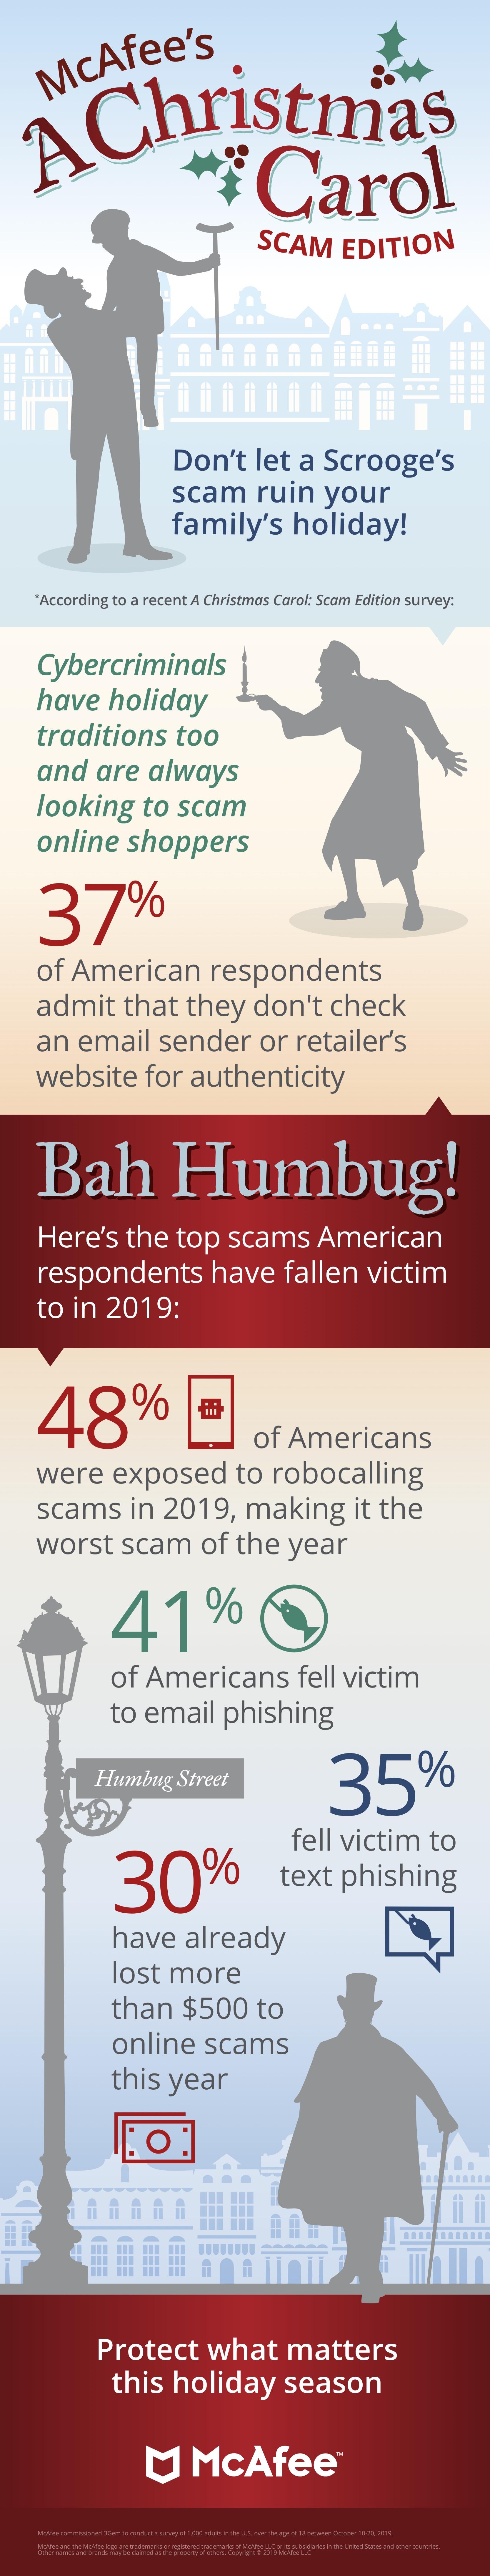 infographic-mcafee-christmas-carol-scam-edition.jpg